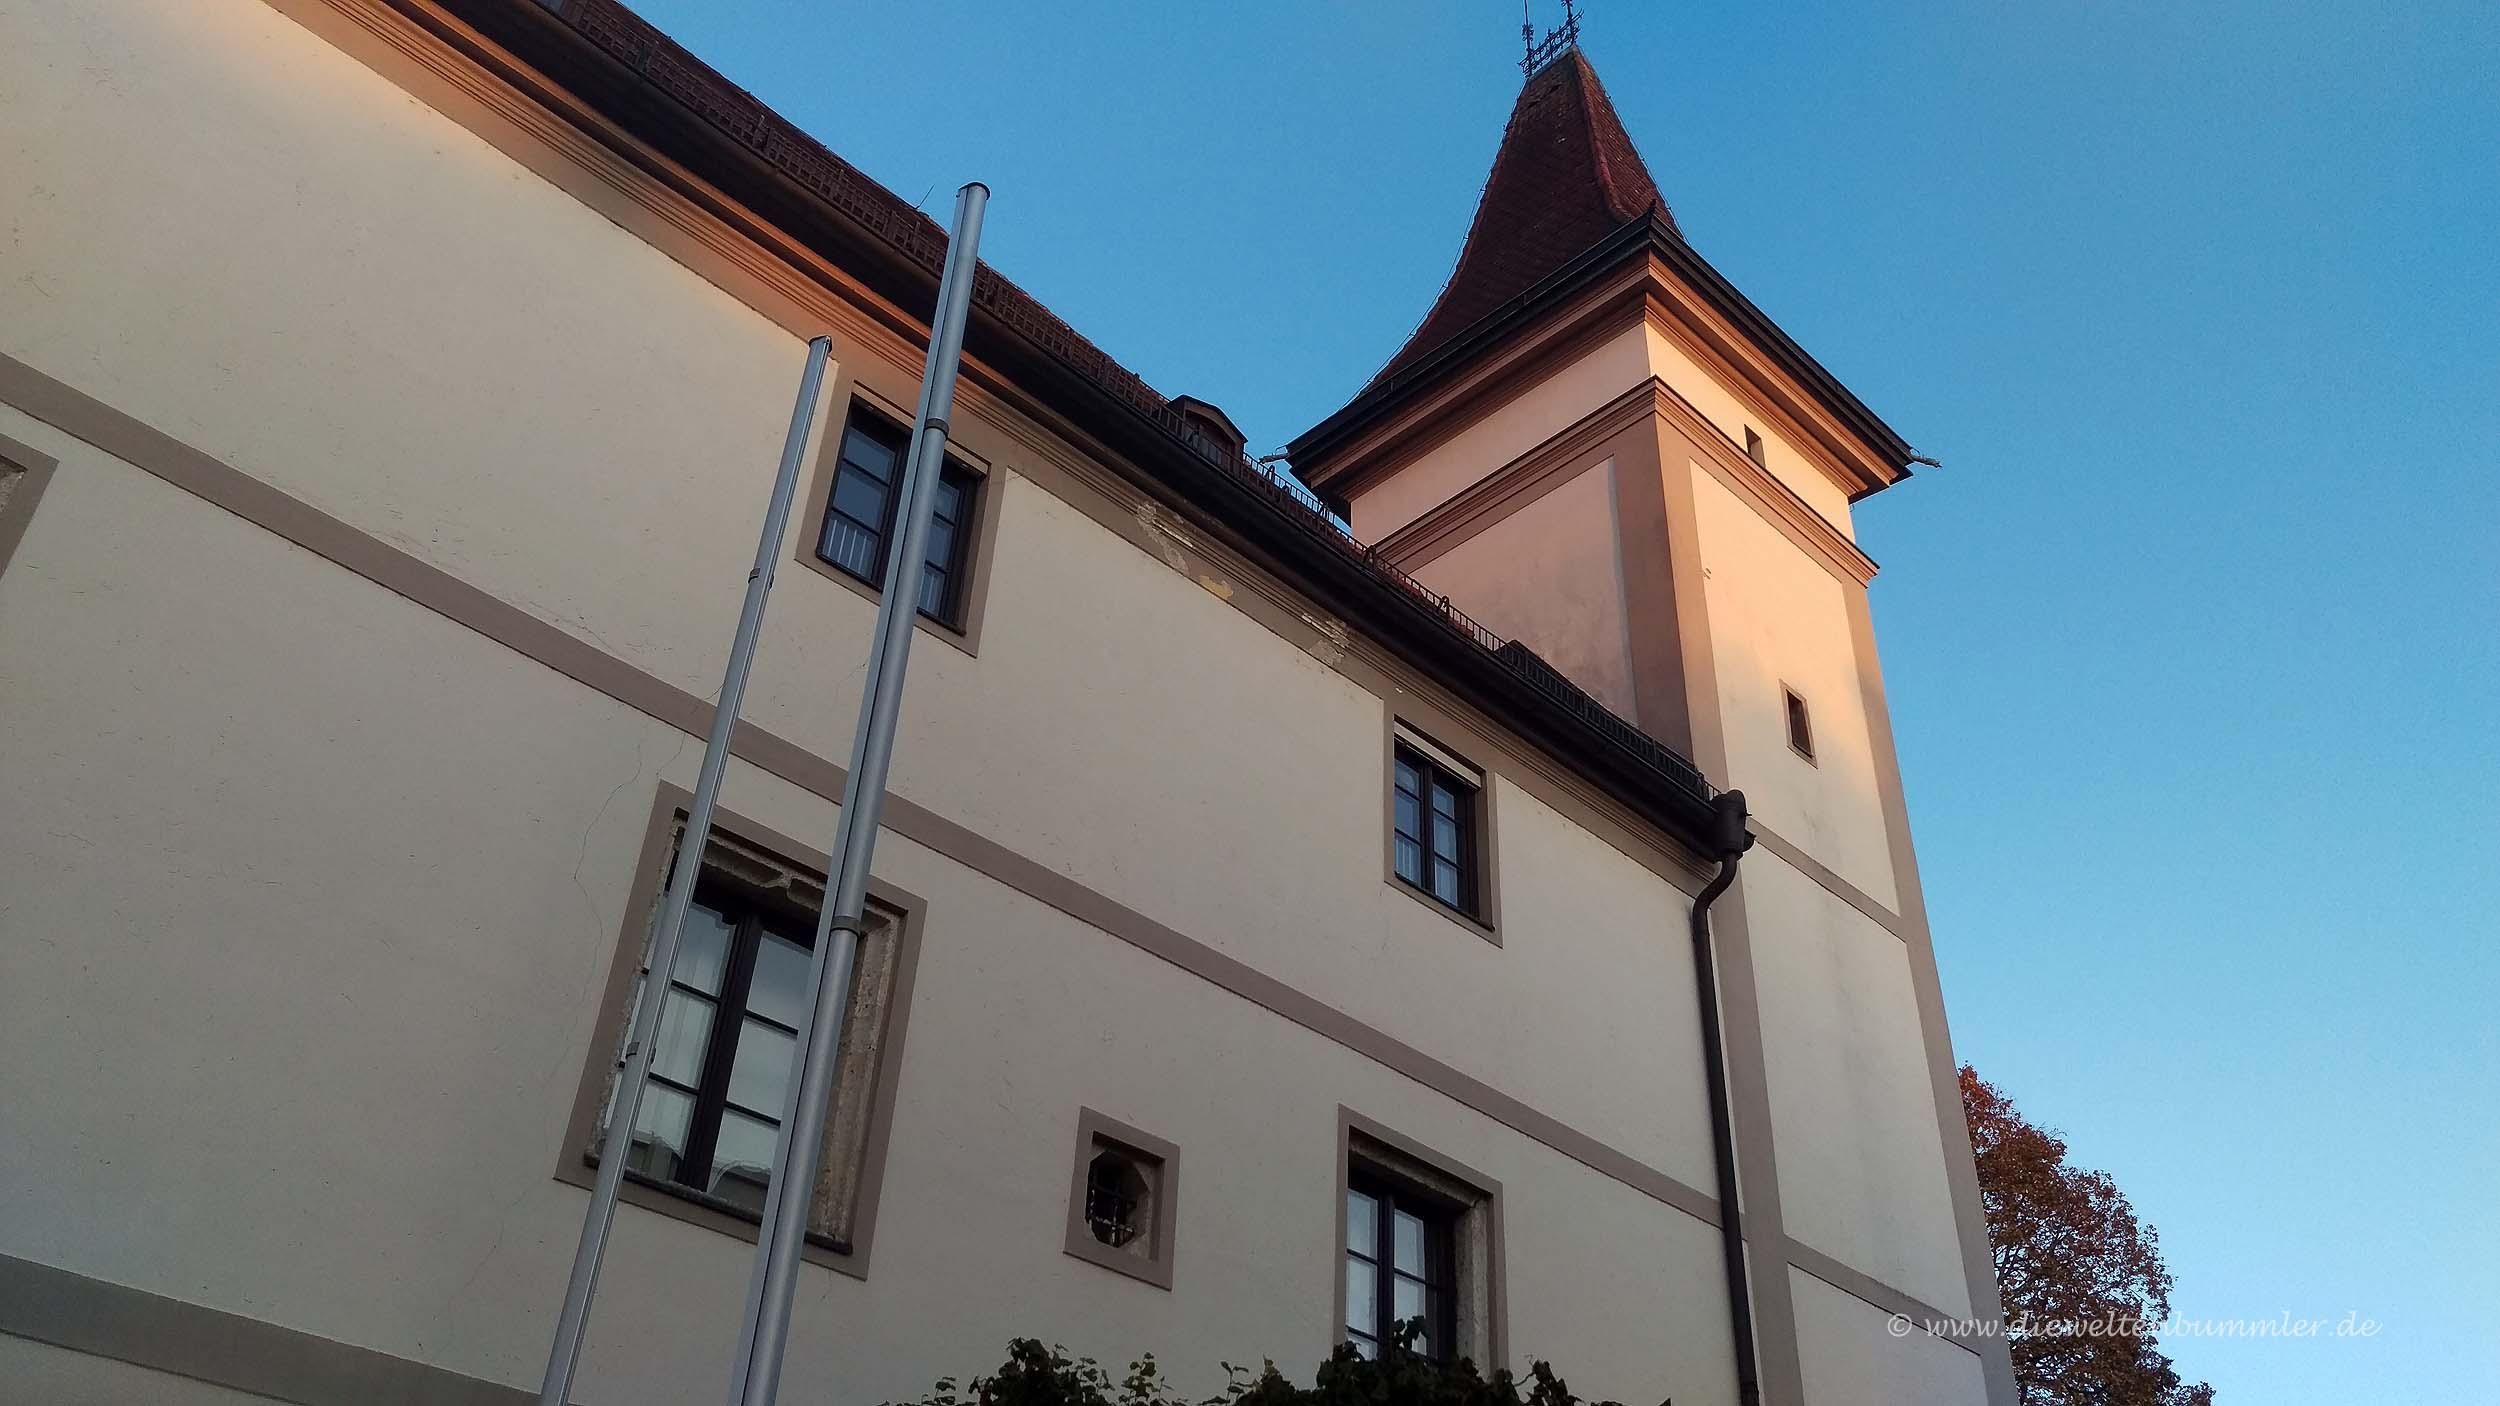 Turm der Burg Wels